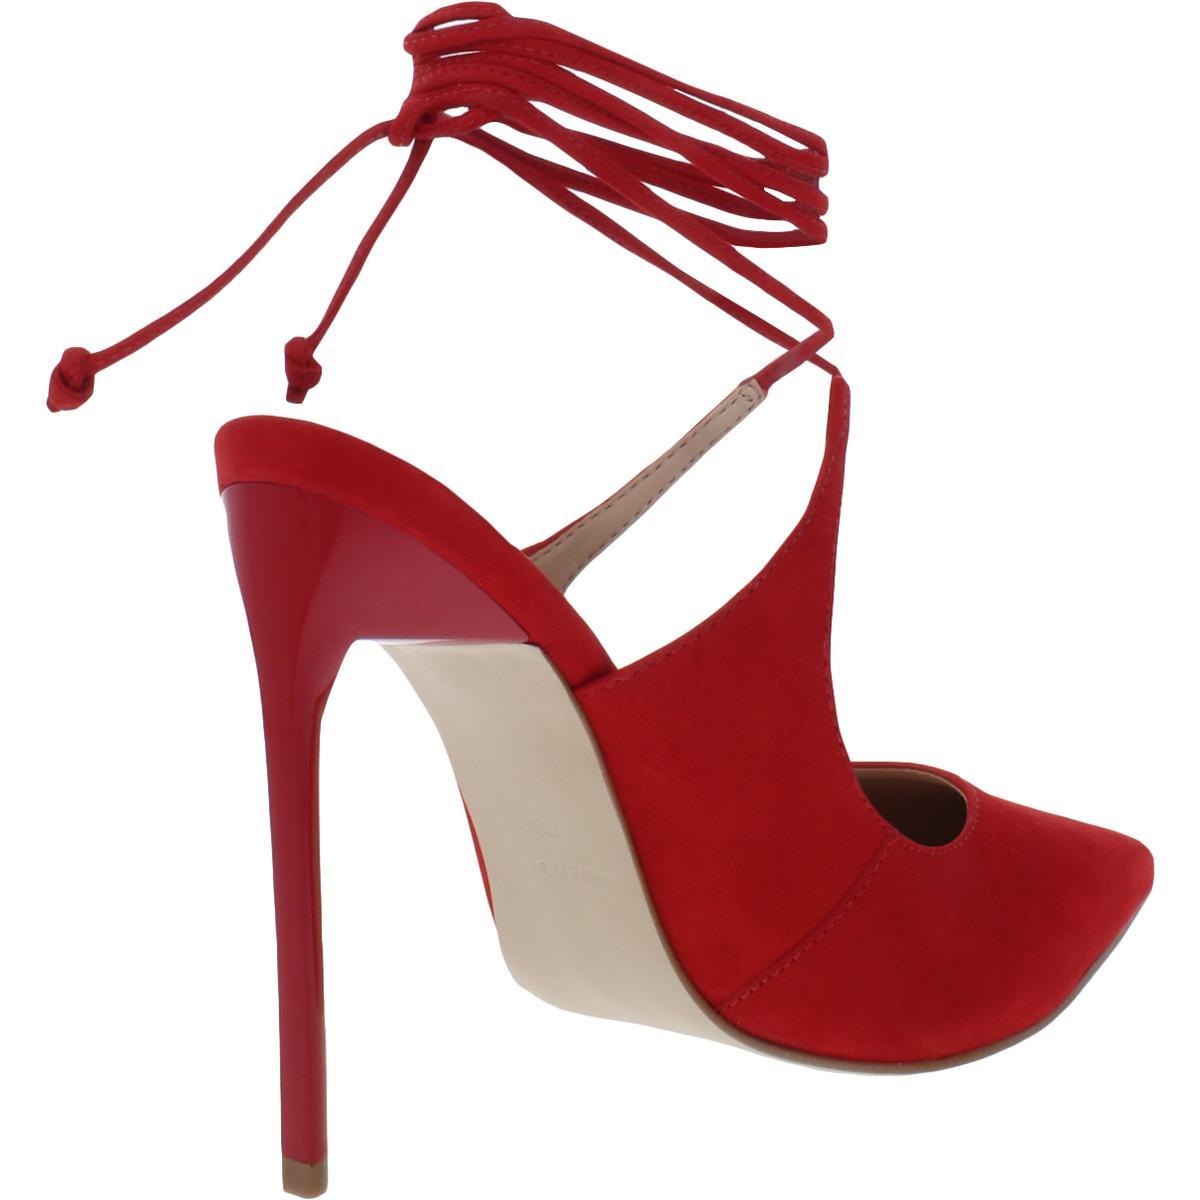 Steve-Madden-Womens-Raven-Nubuck-Ankle-Wrap-Shoes-Mules-Heels-BHFO-1622 thumbnail 6